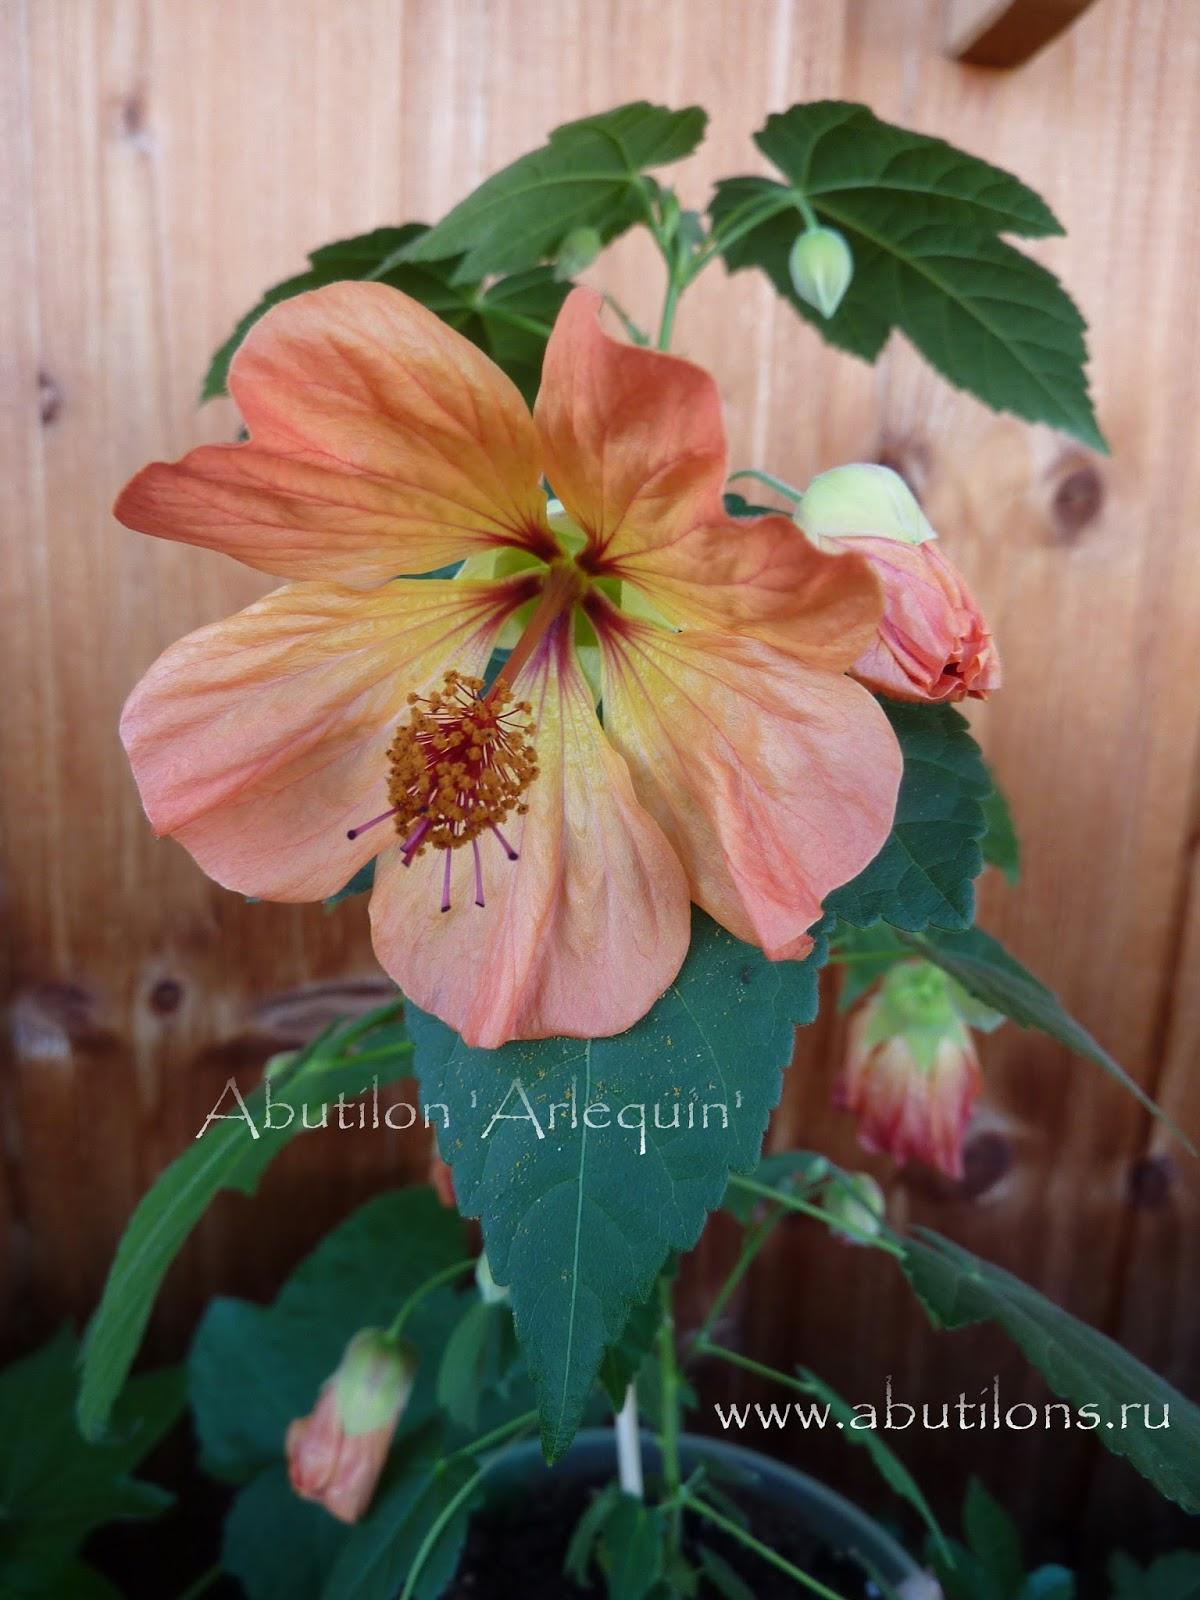 Abutilon Cross Pollination Breeding Propagation